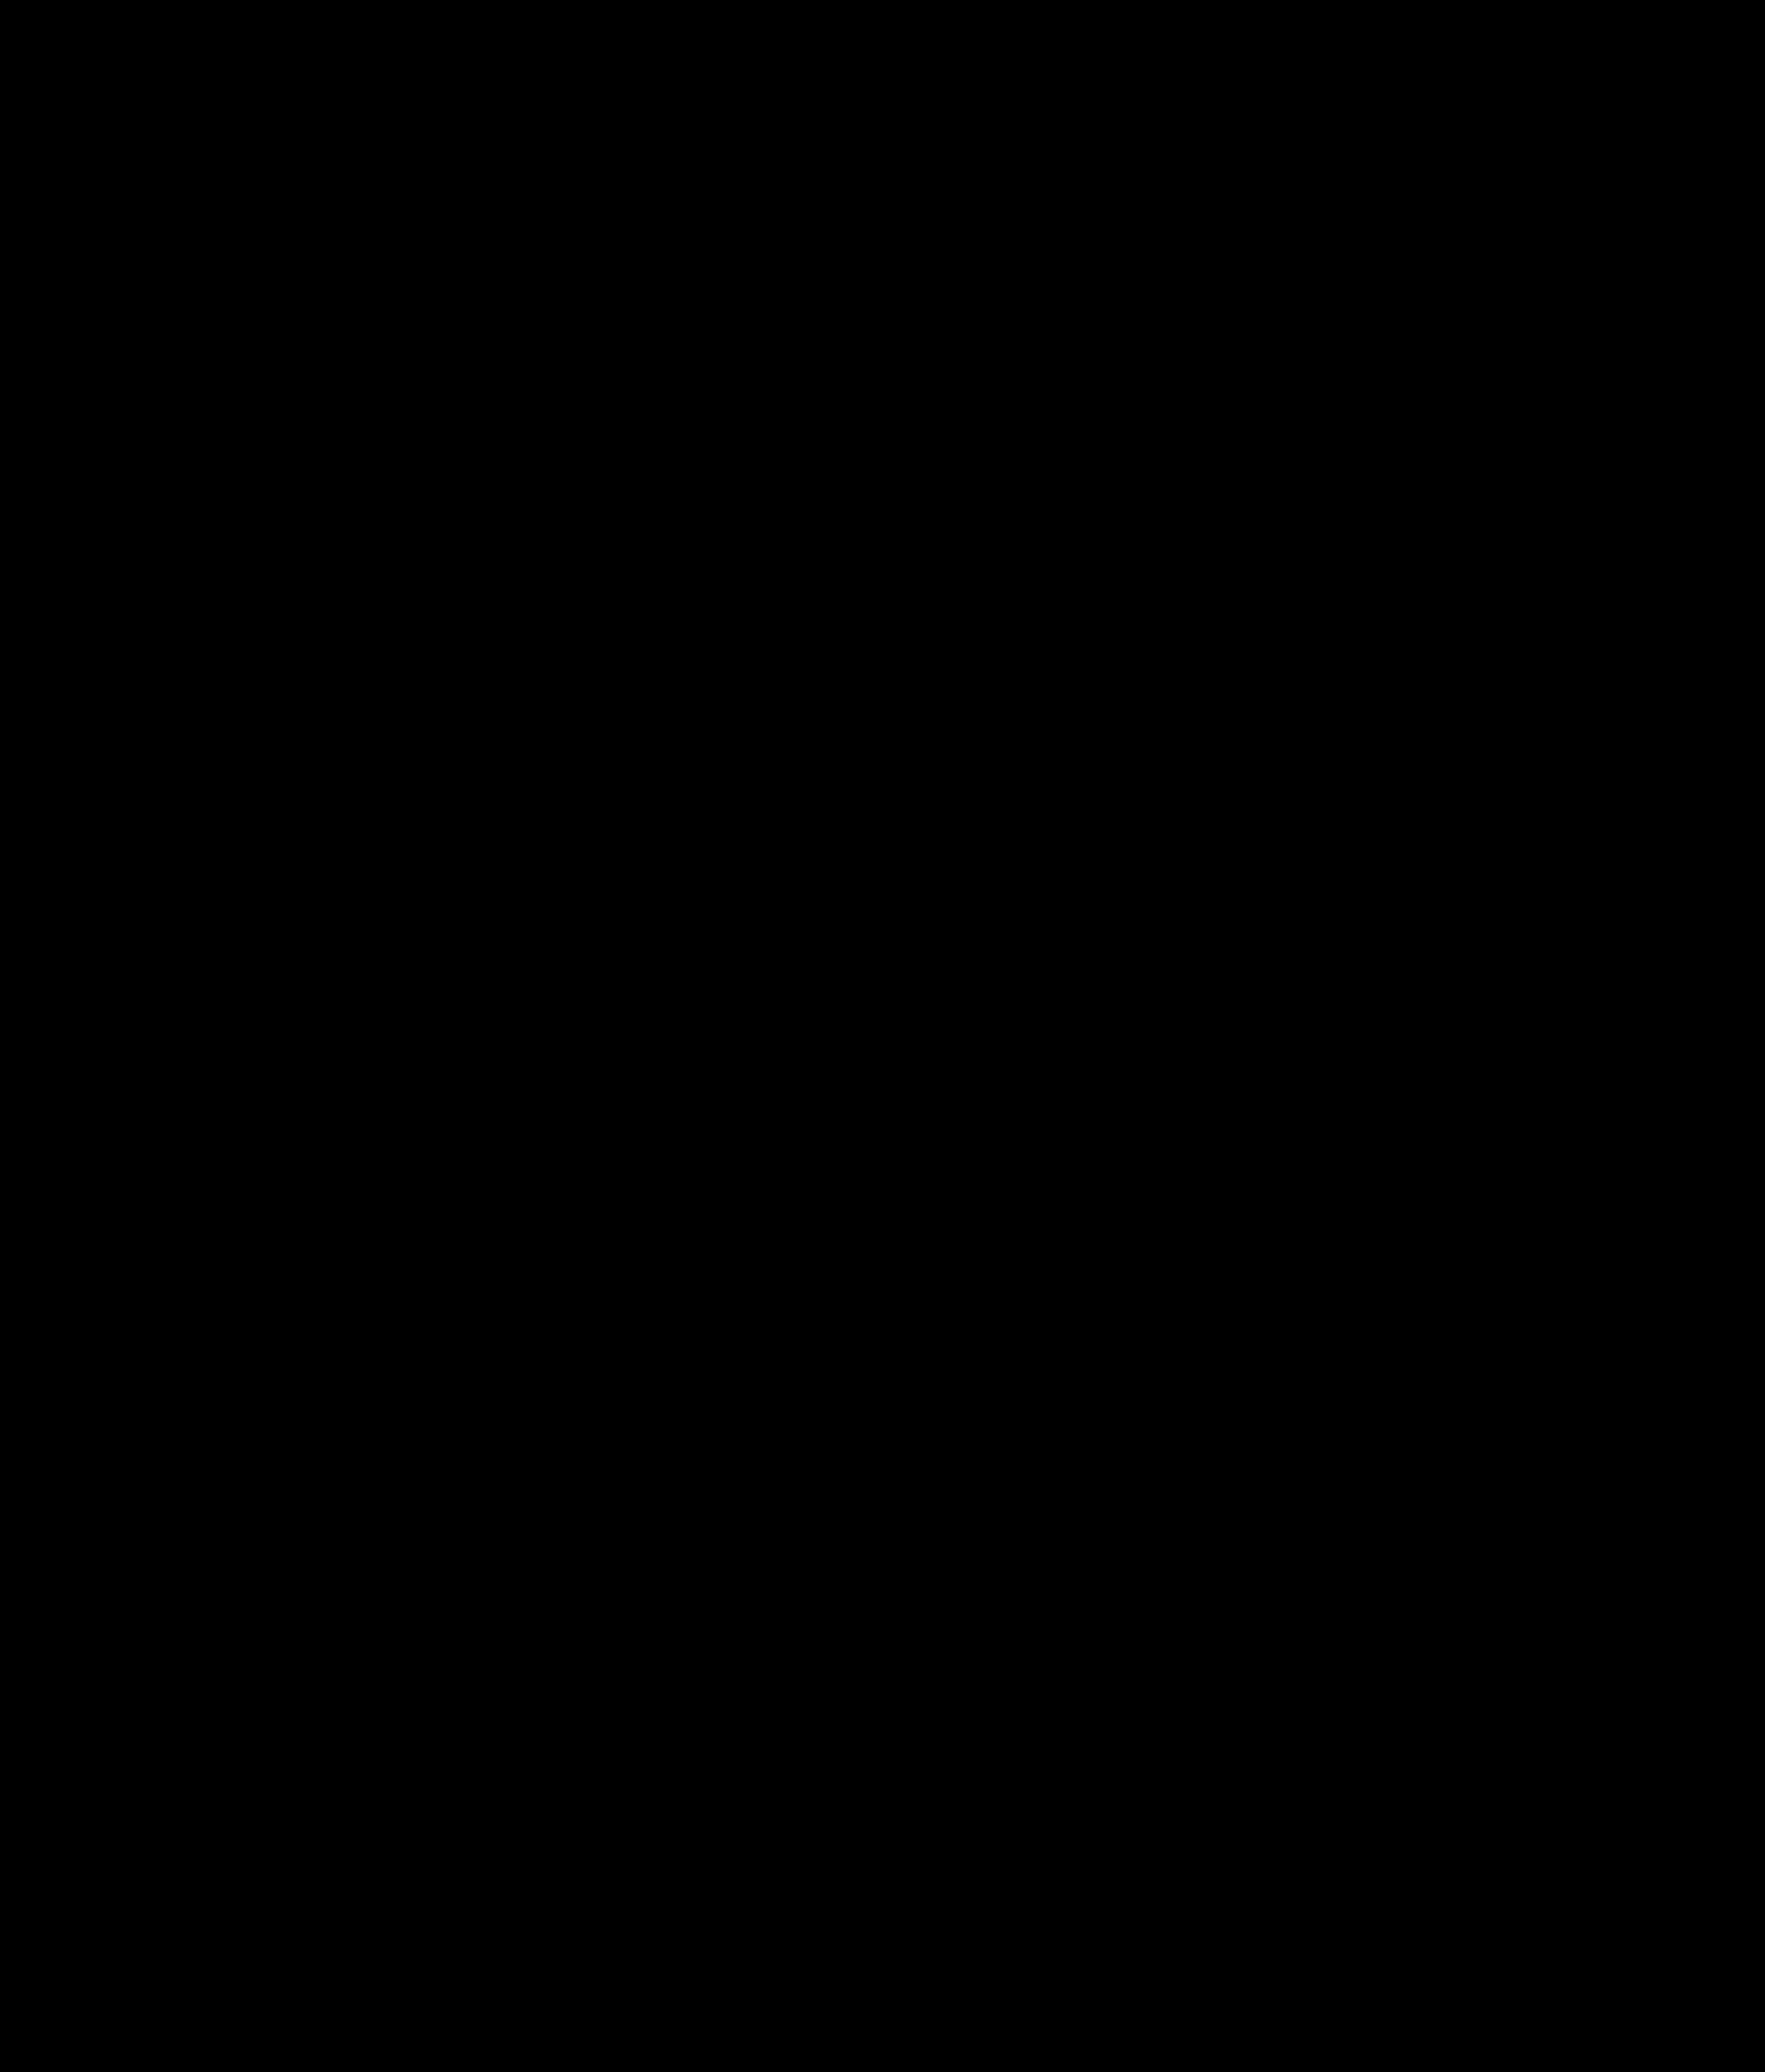 Gemini Twins zodiac symbol vector clipart image - Free ...